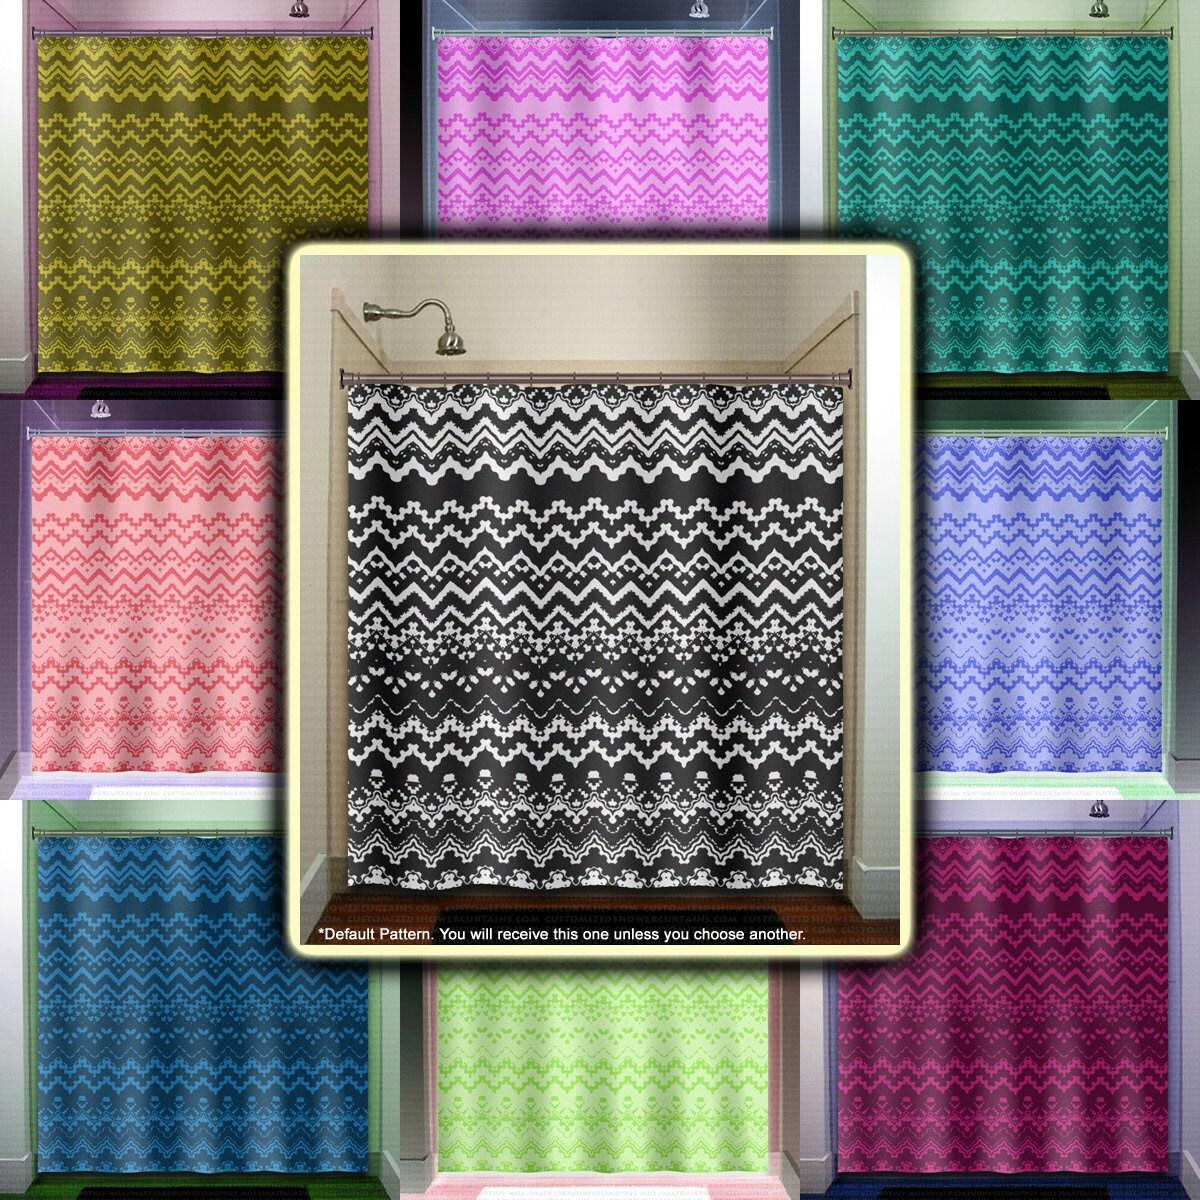 black white lace shower curtain bathroom decor fabric kids. Black Bedroom Furniture Sets. Home Design Ideas